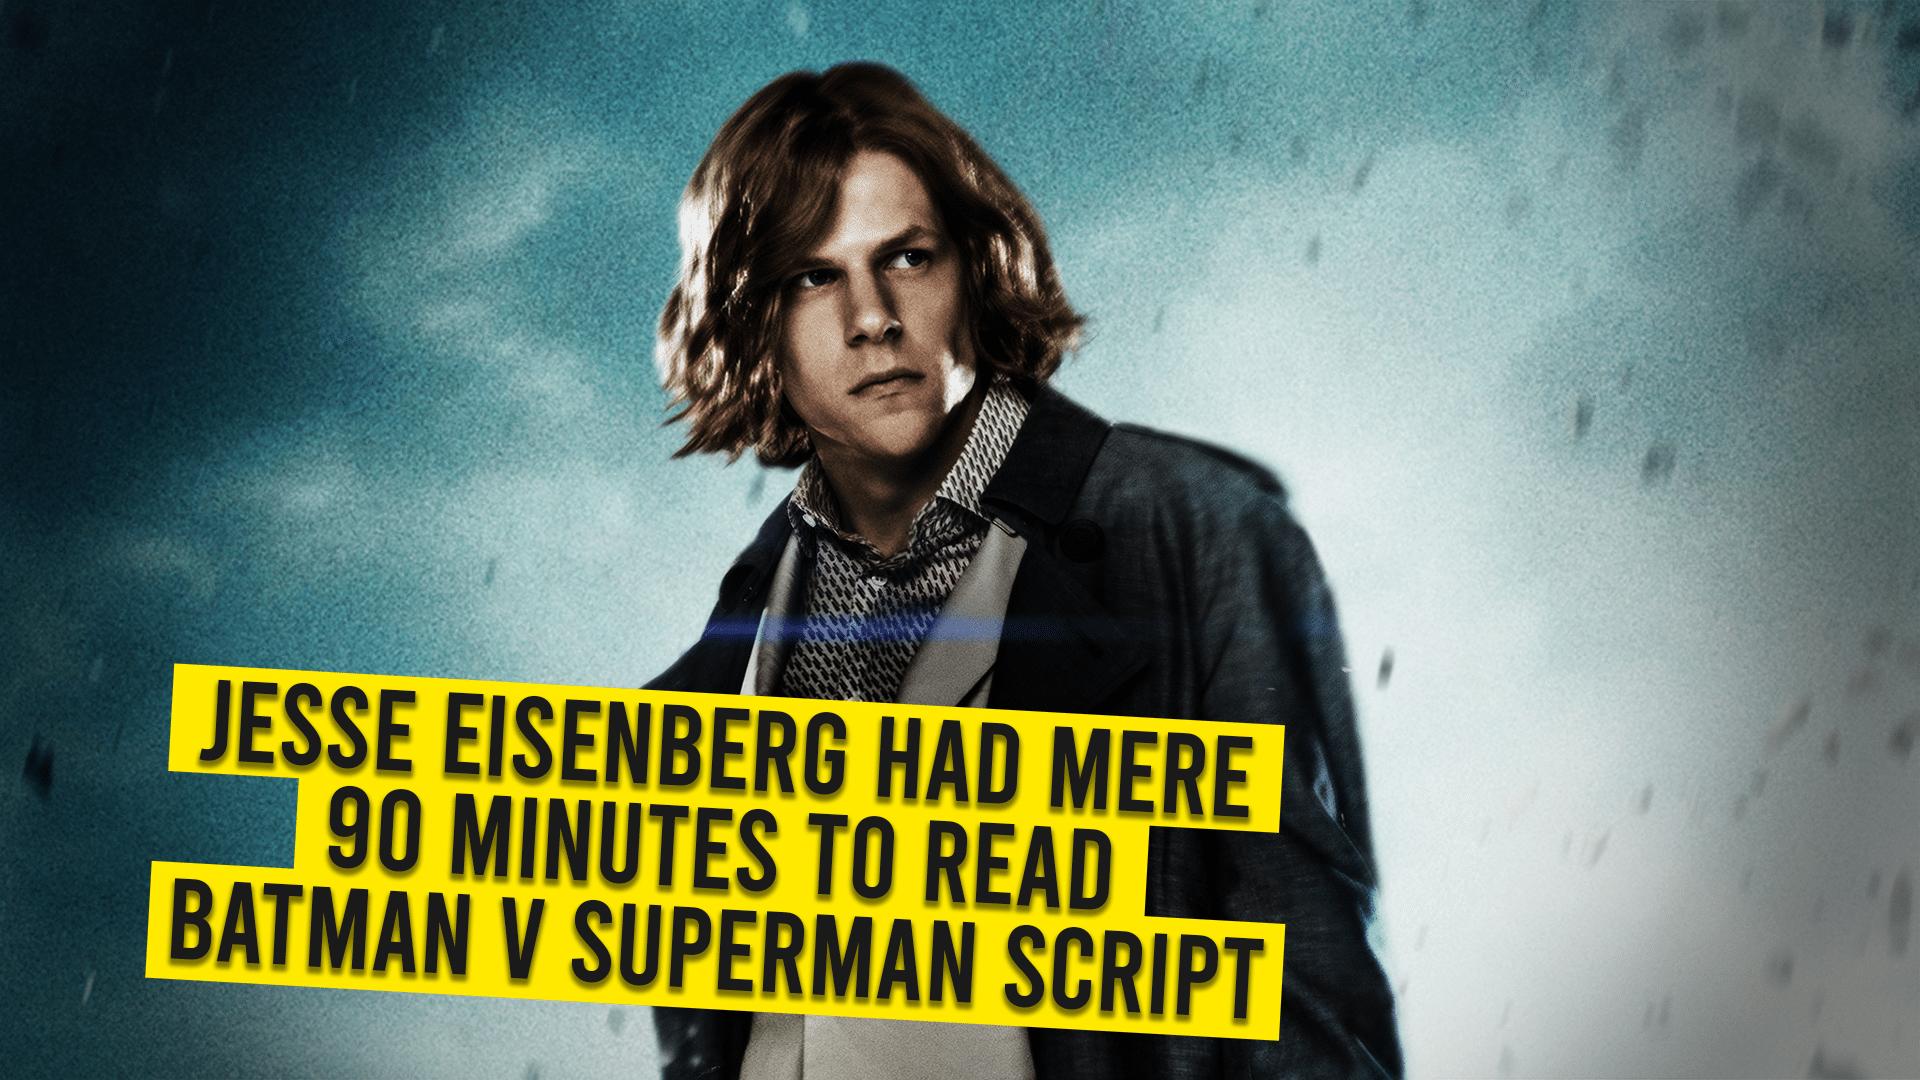 Jesse Eisenberg Had Mere 90 Minutes To Read Batman V